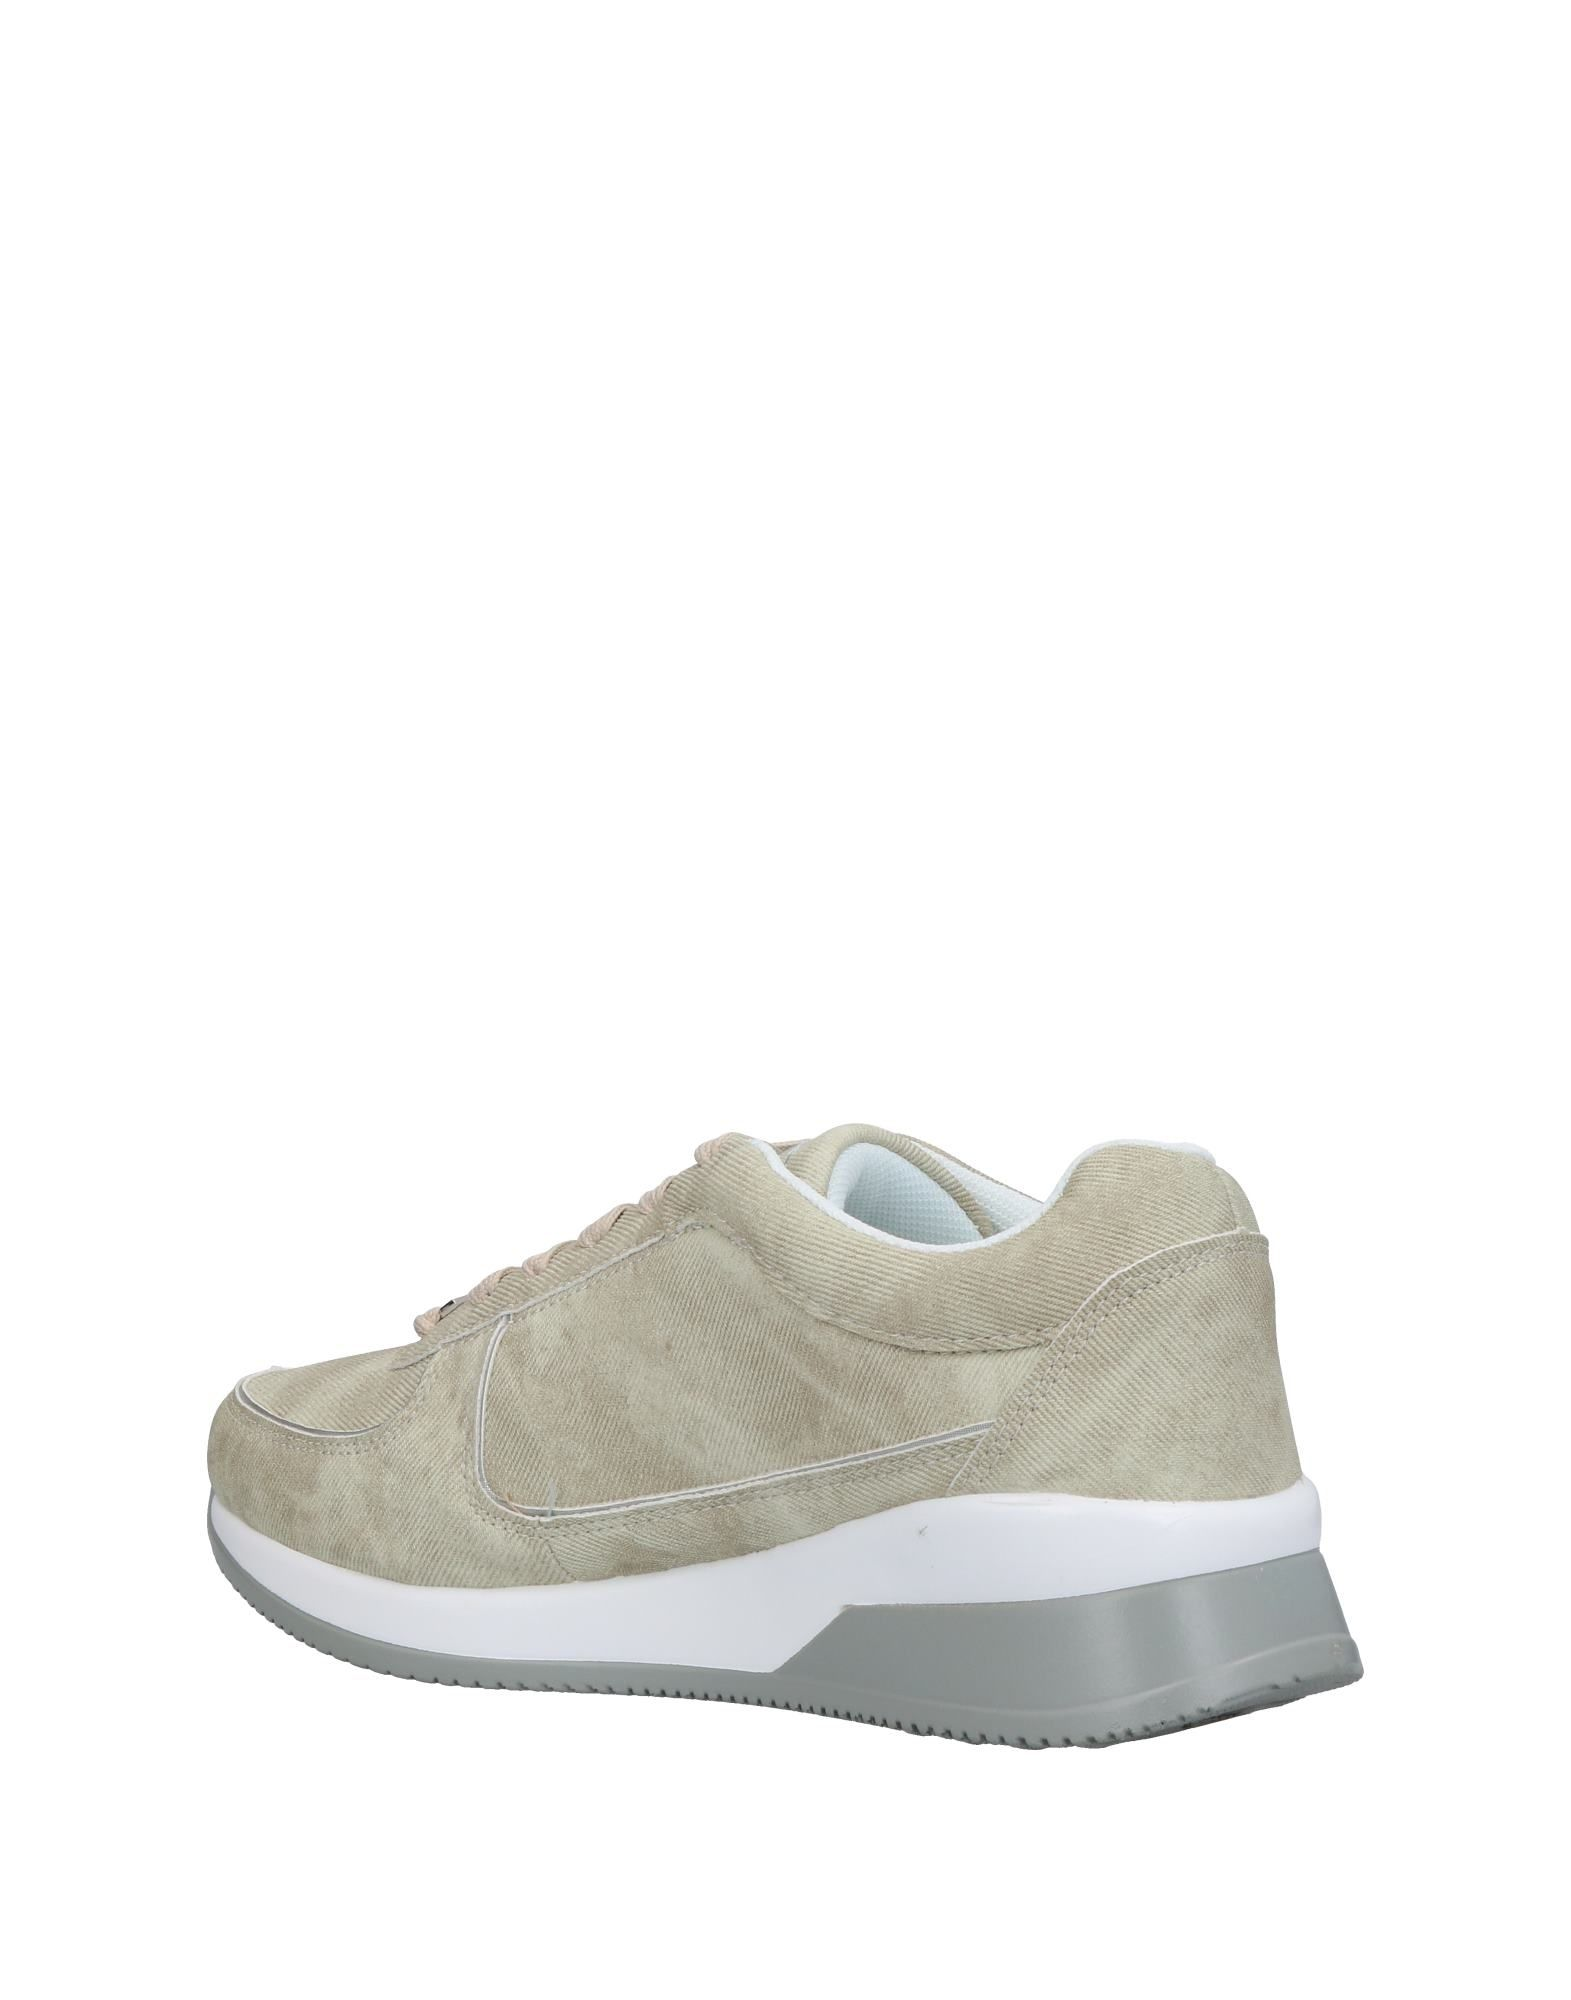 Chaussures - Tribunaux Biagiotti Laura 0Qb1HH